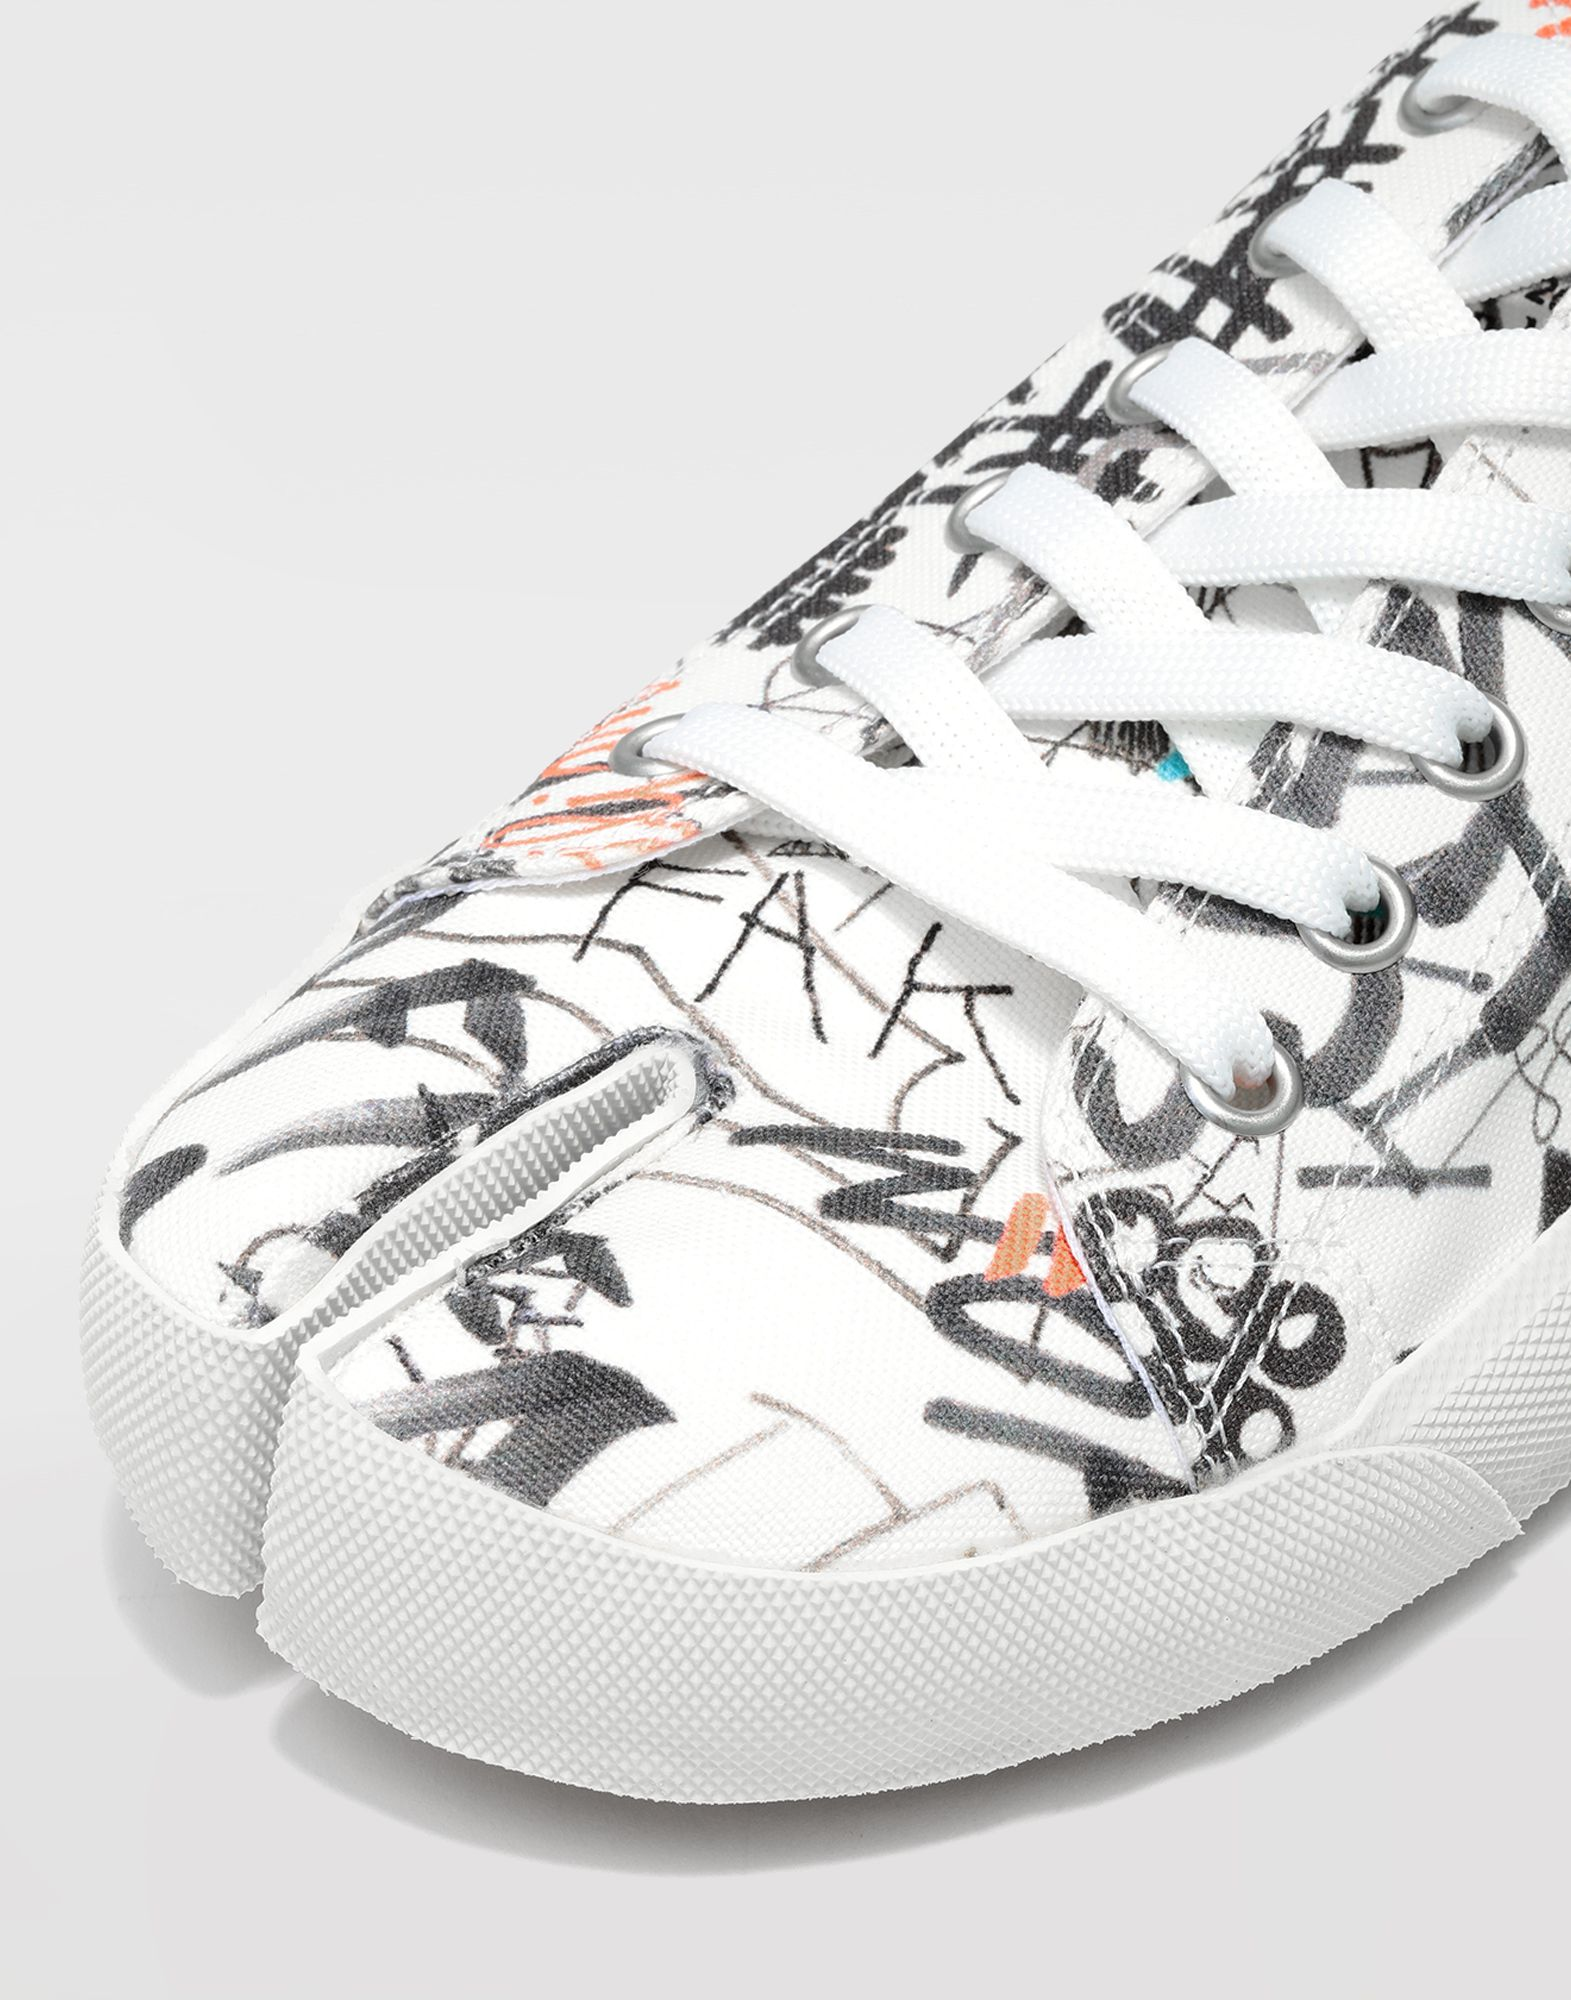 MAISON MARGIELA Graffiti Tabi sneakers Sneakers Man a